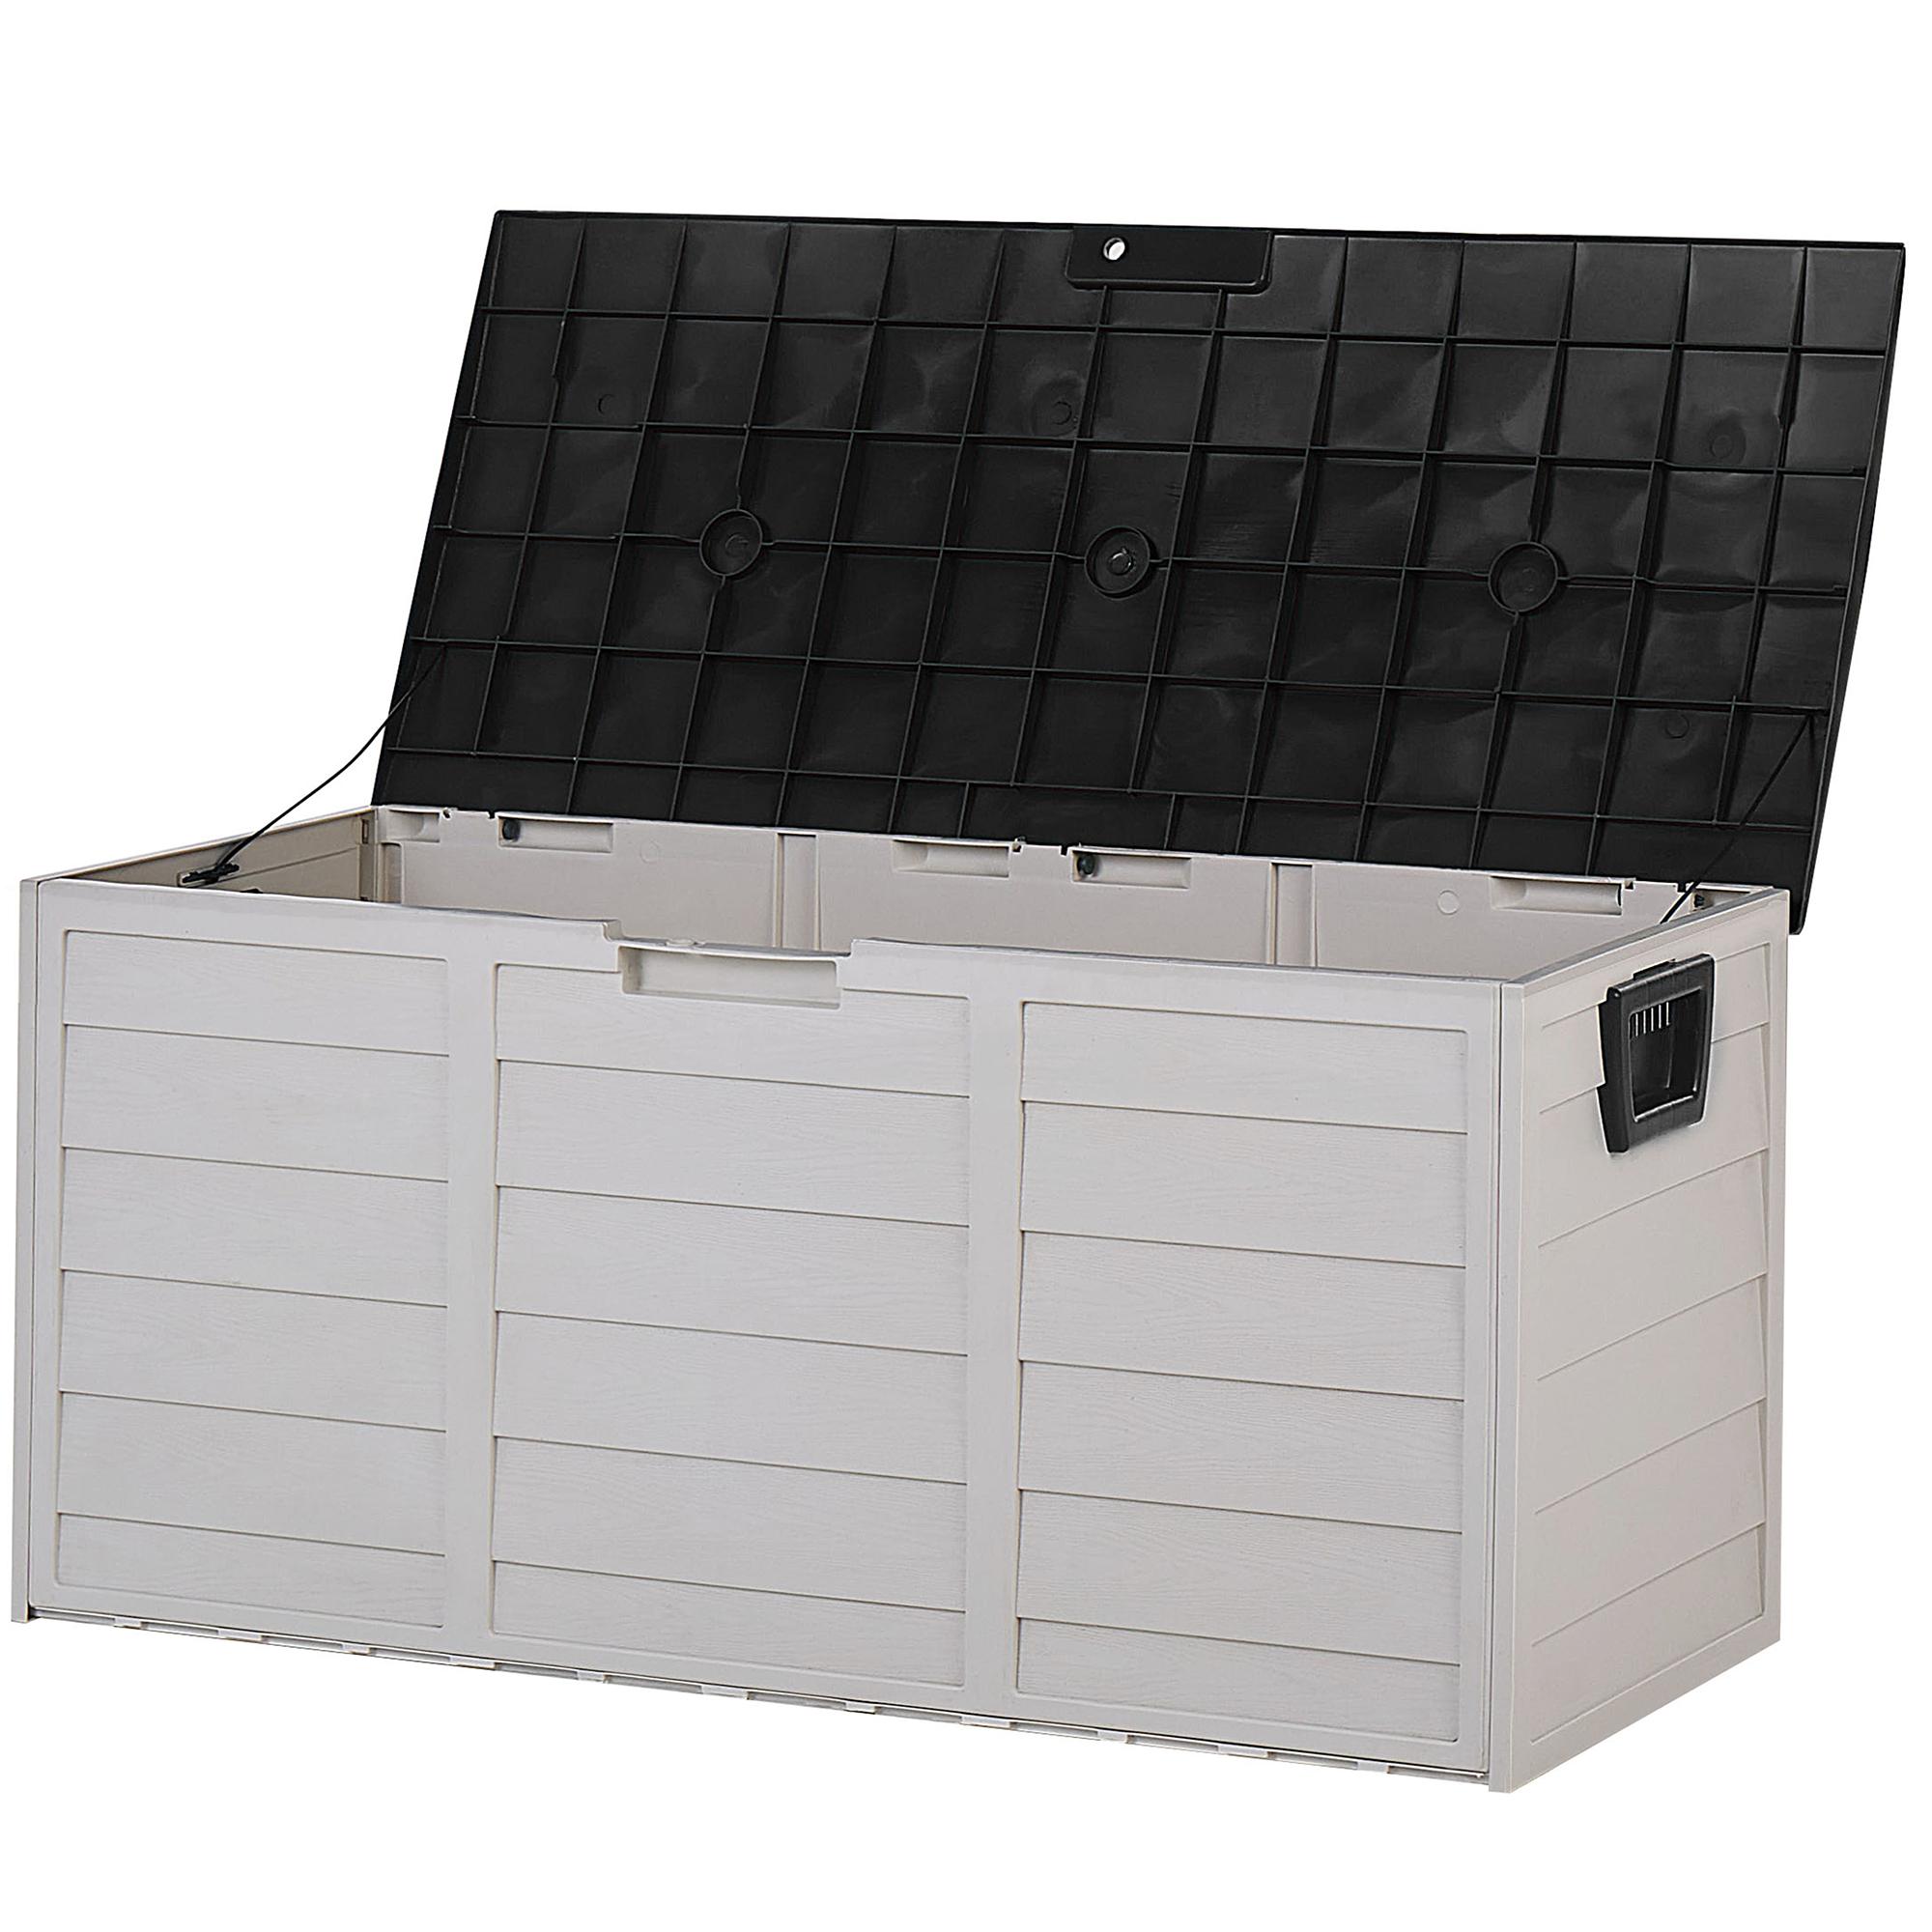 Beliani Opbergbox kunststof beige/zwart 112 x 50 cm LOCARNO